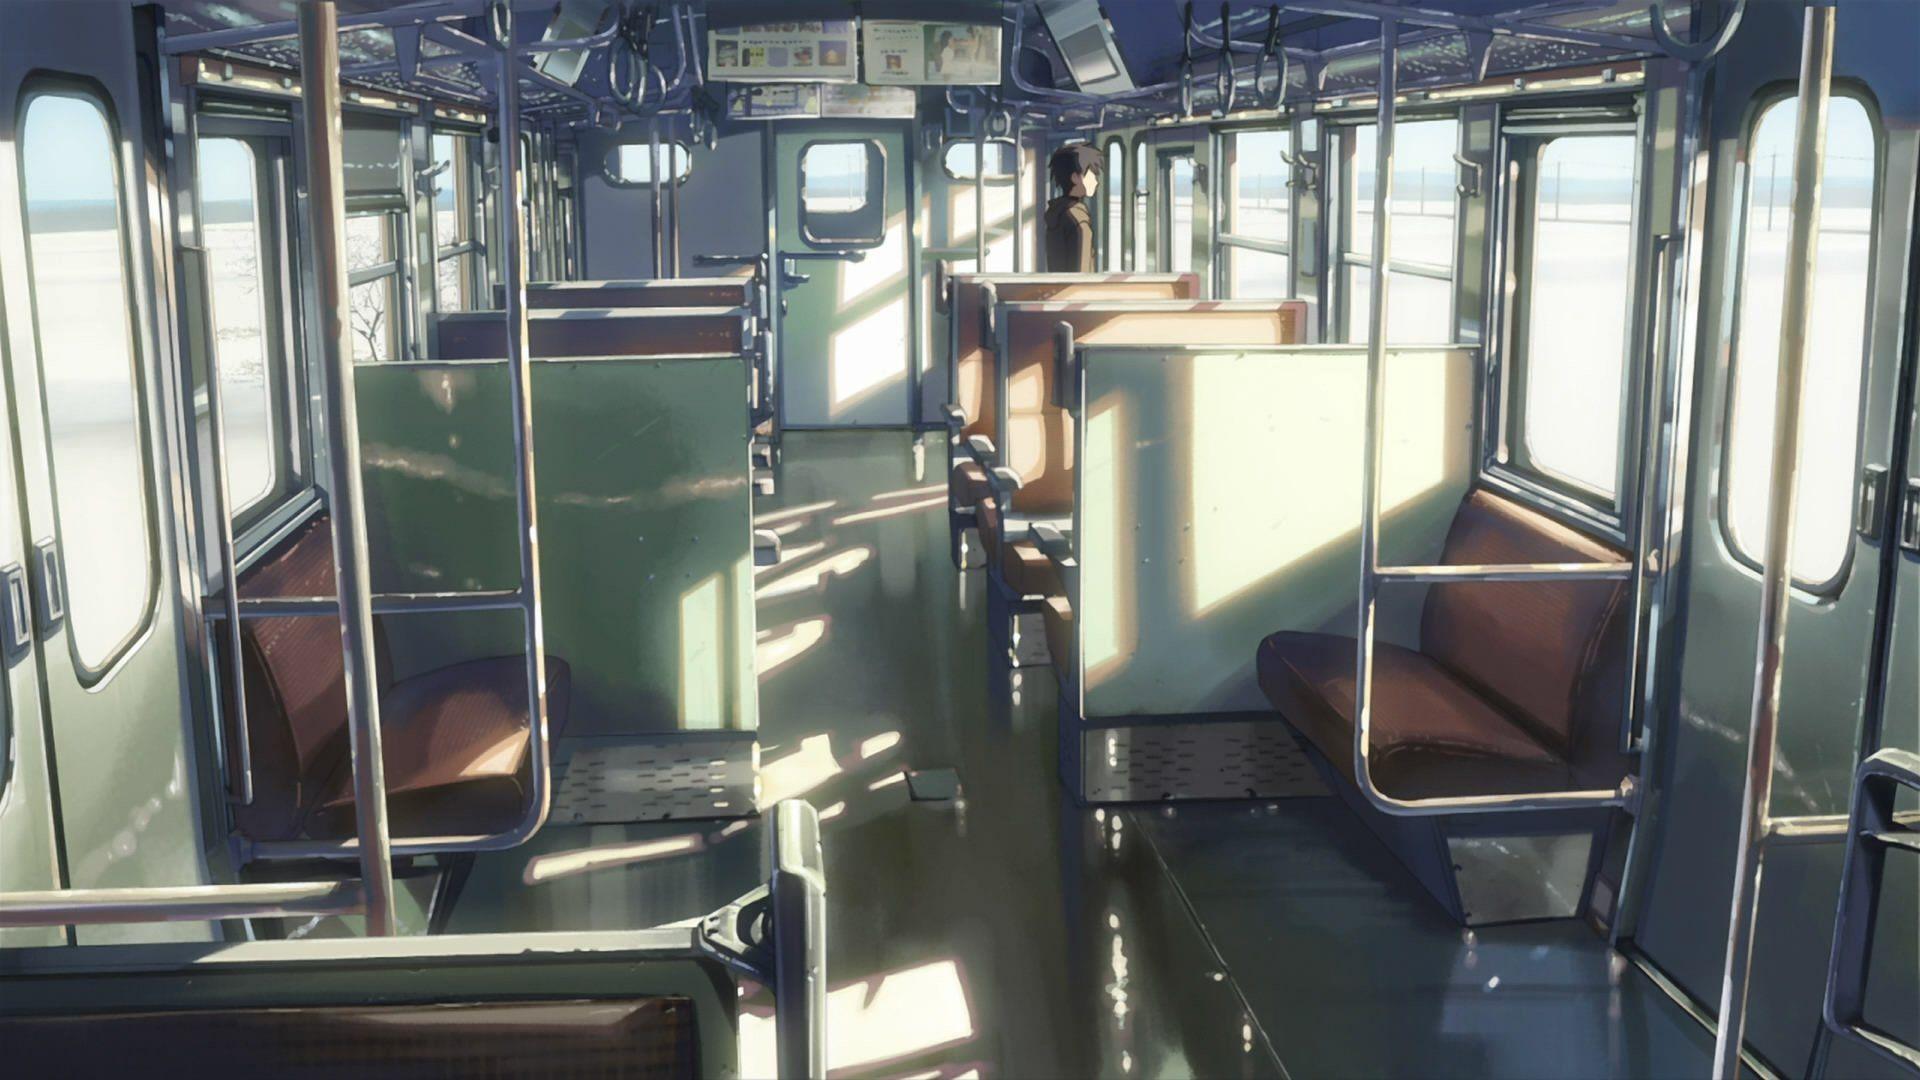 trains Makoto Shinkai 5 Centimeters Per Second anime